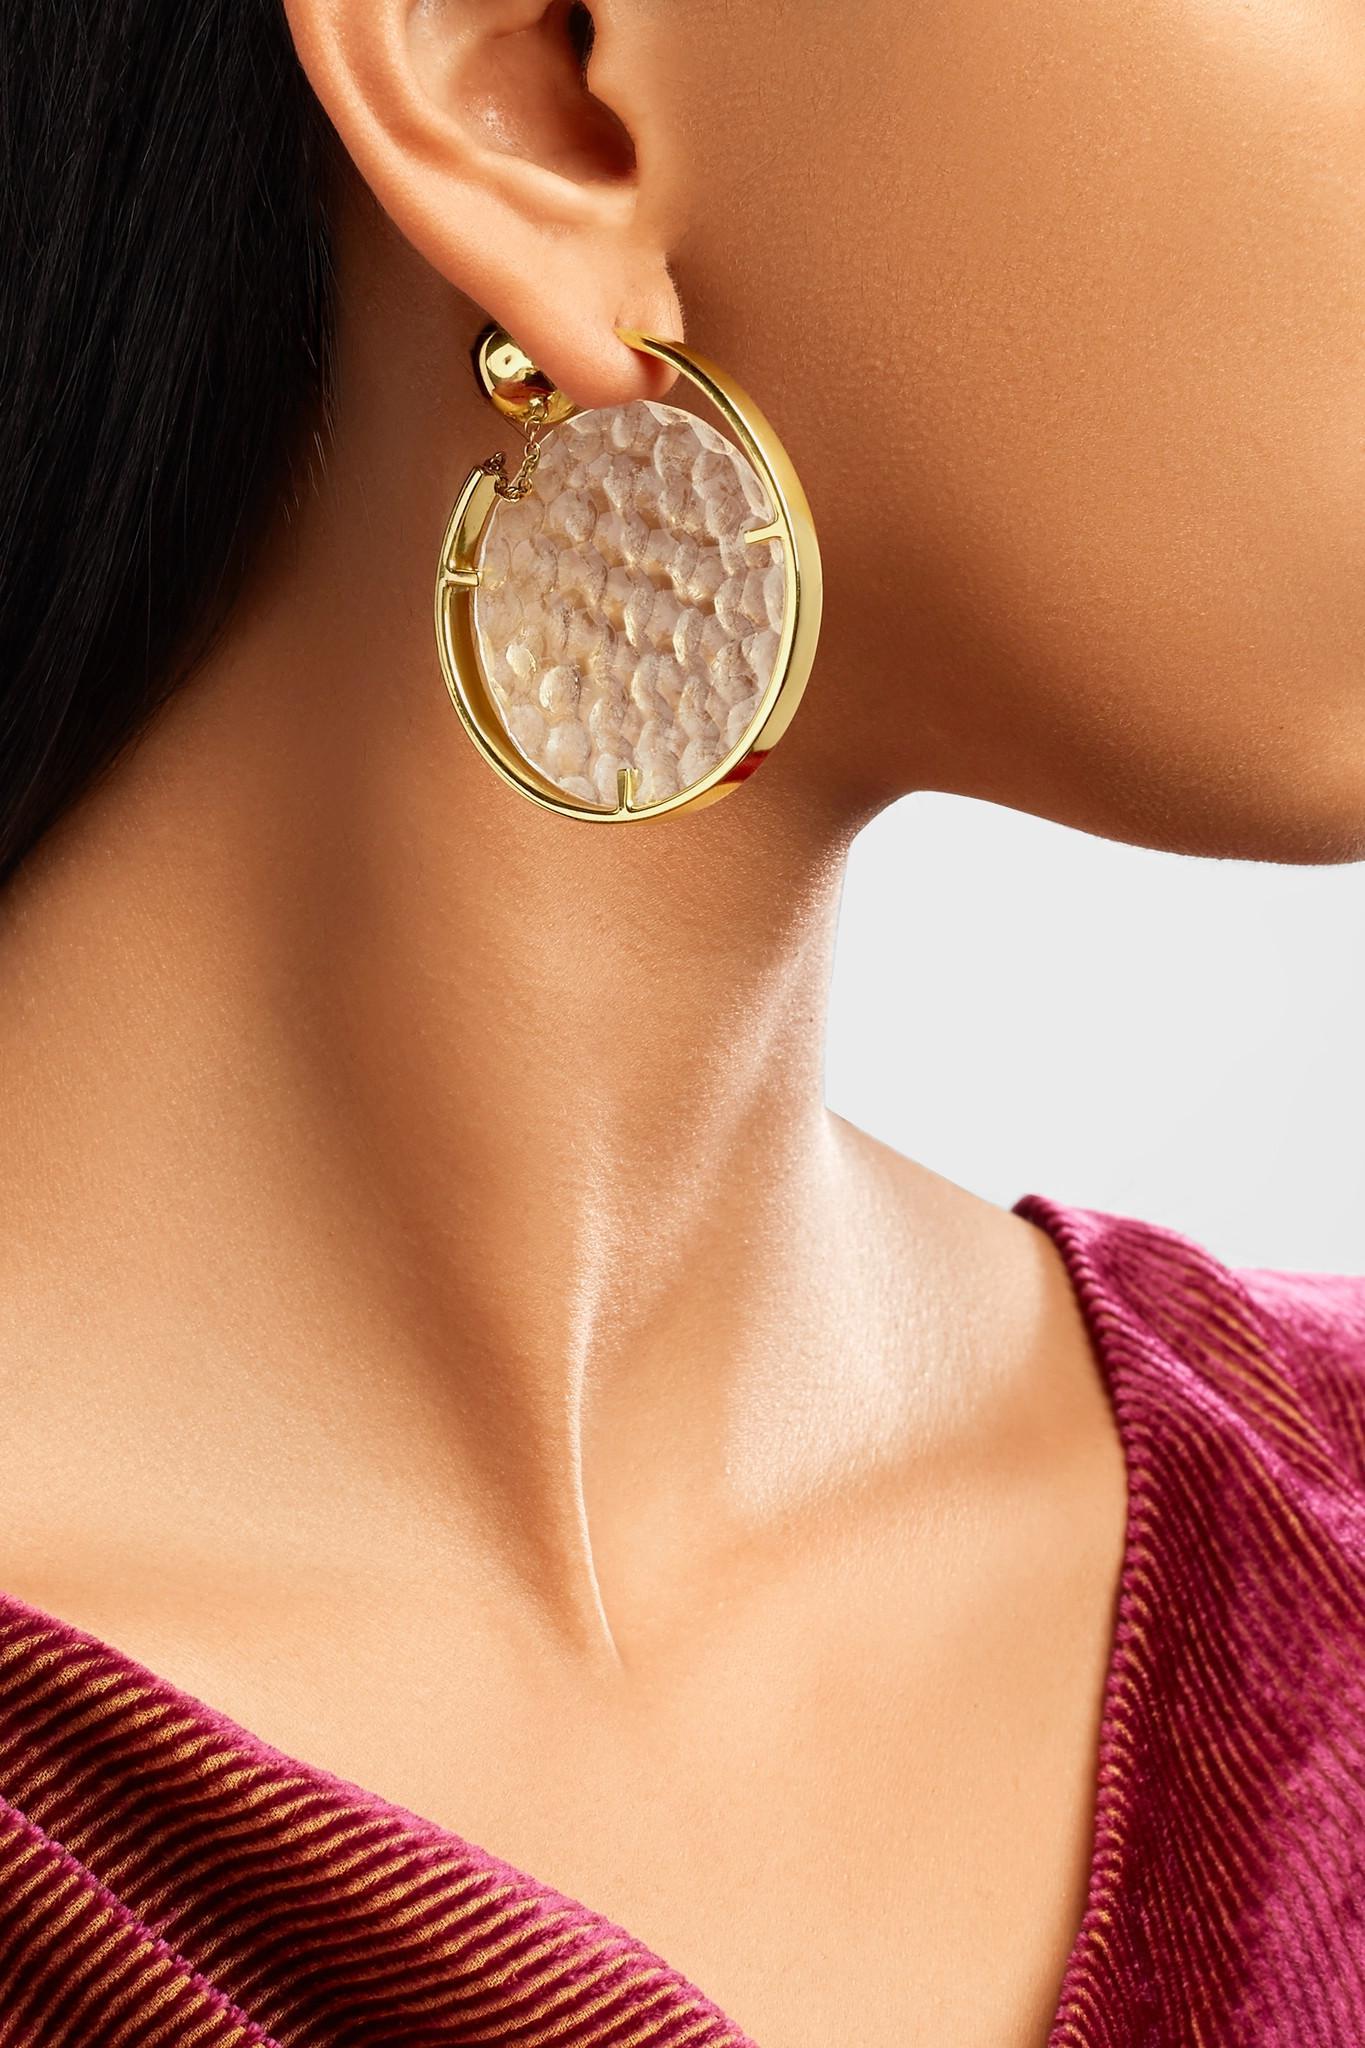 Ellery Low Art Revolving Gold-plated And Resin Hoop Earring 2j8p8